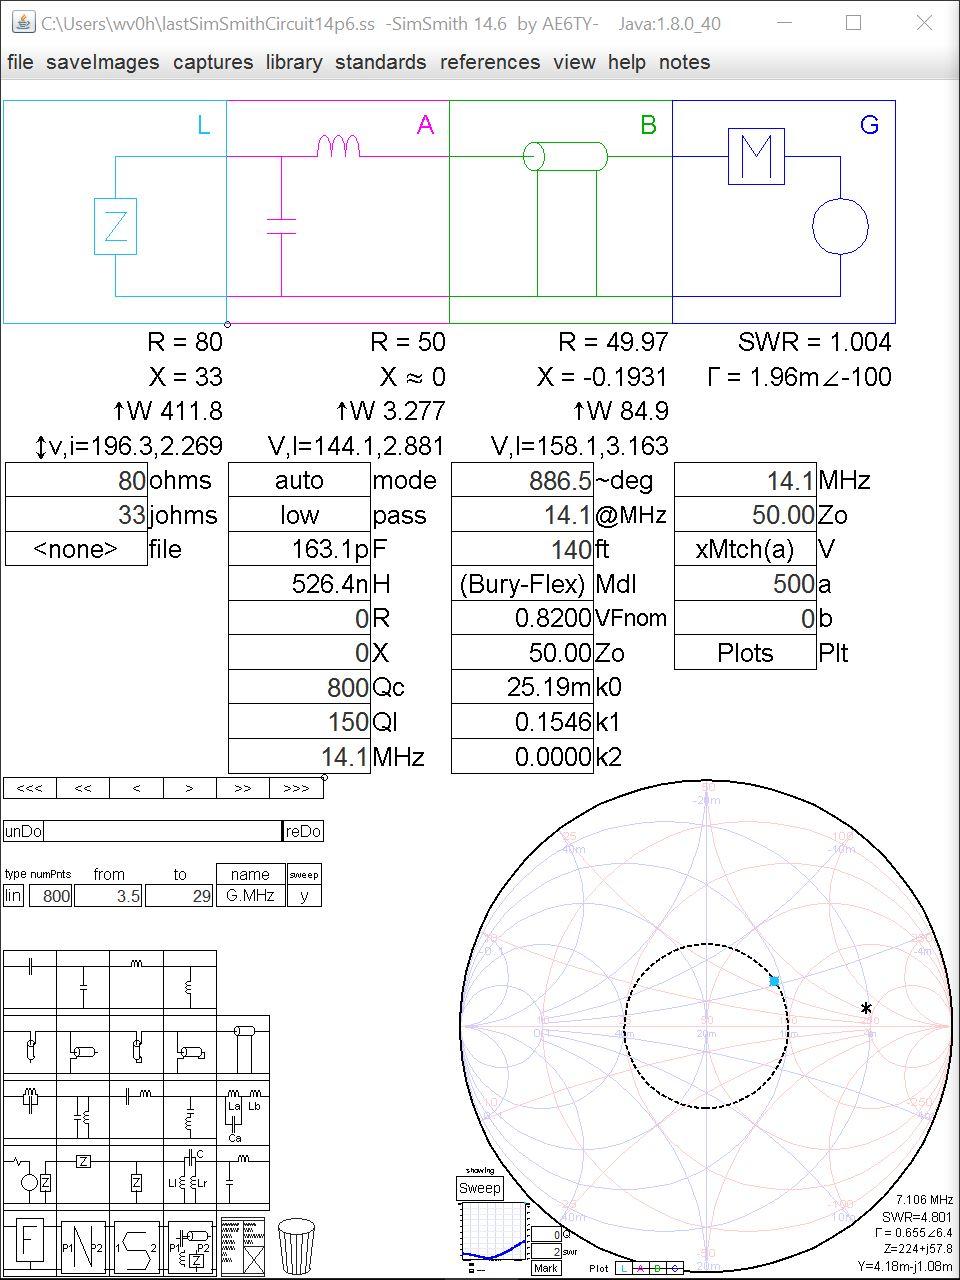 case 1b 2 1 high z 80 j33ohms tuner at antenna [ 960 x 1280 Pixel ]